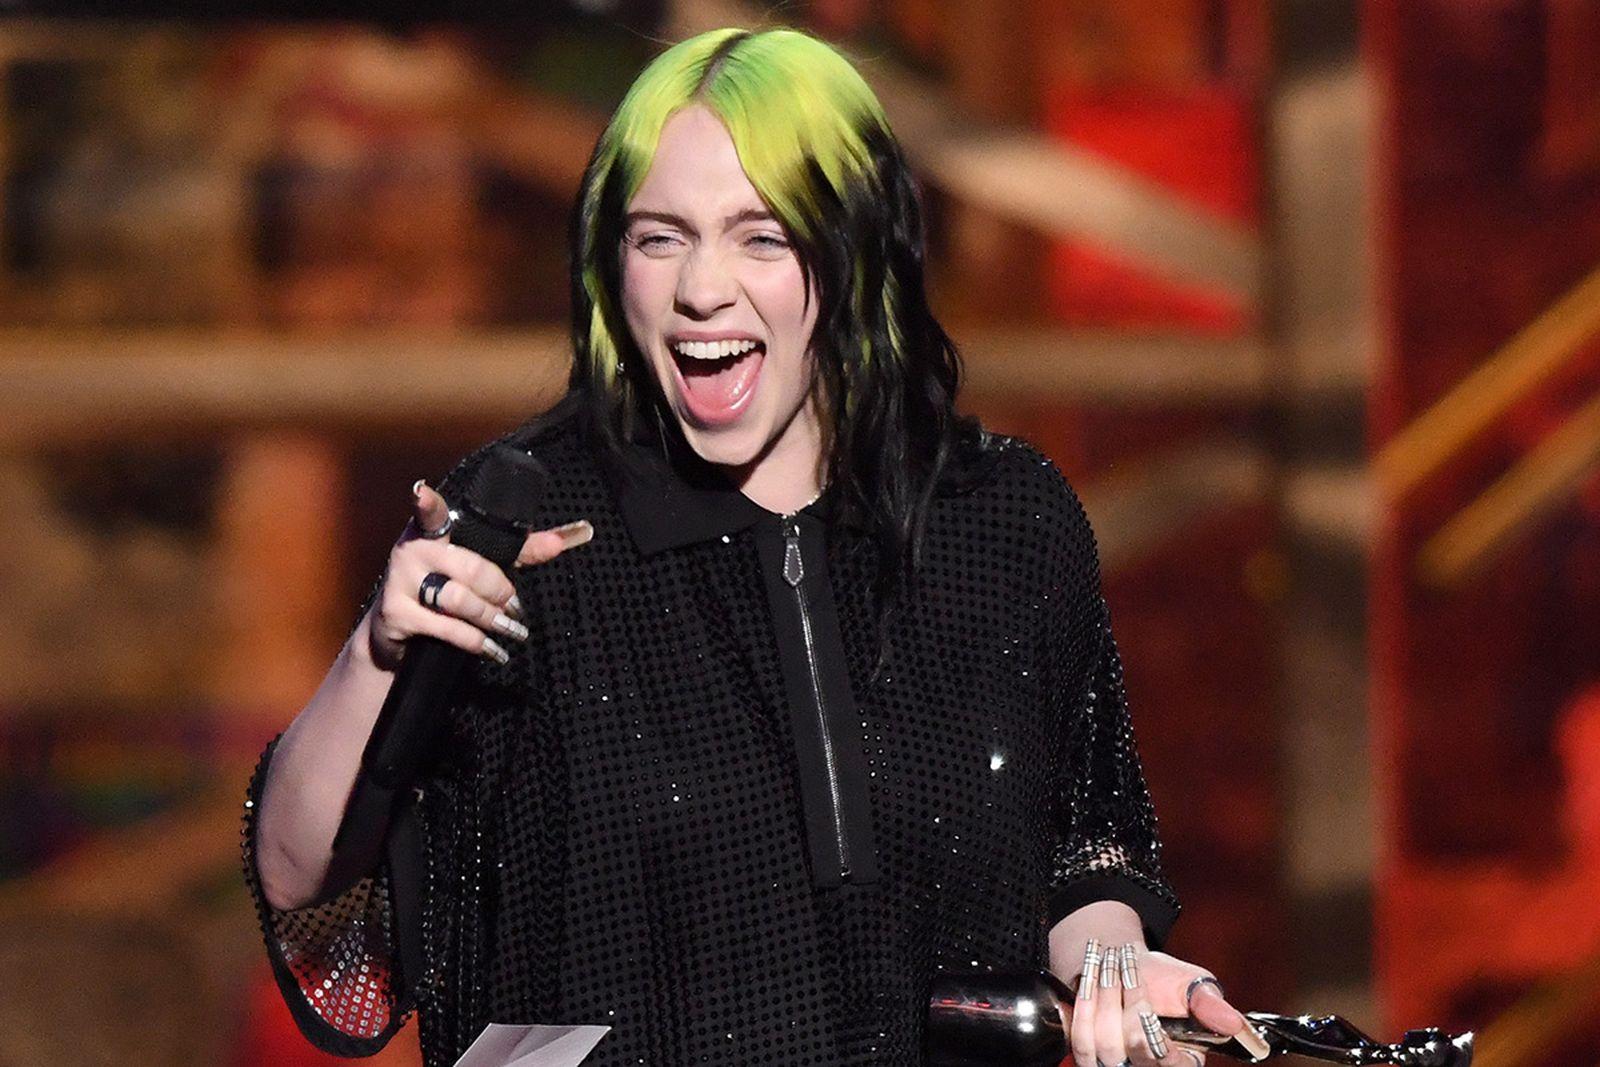 Billie Eilish wins the International Female Solo Artist award